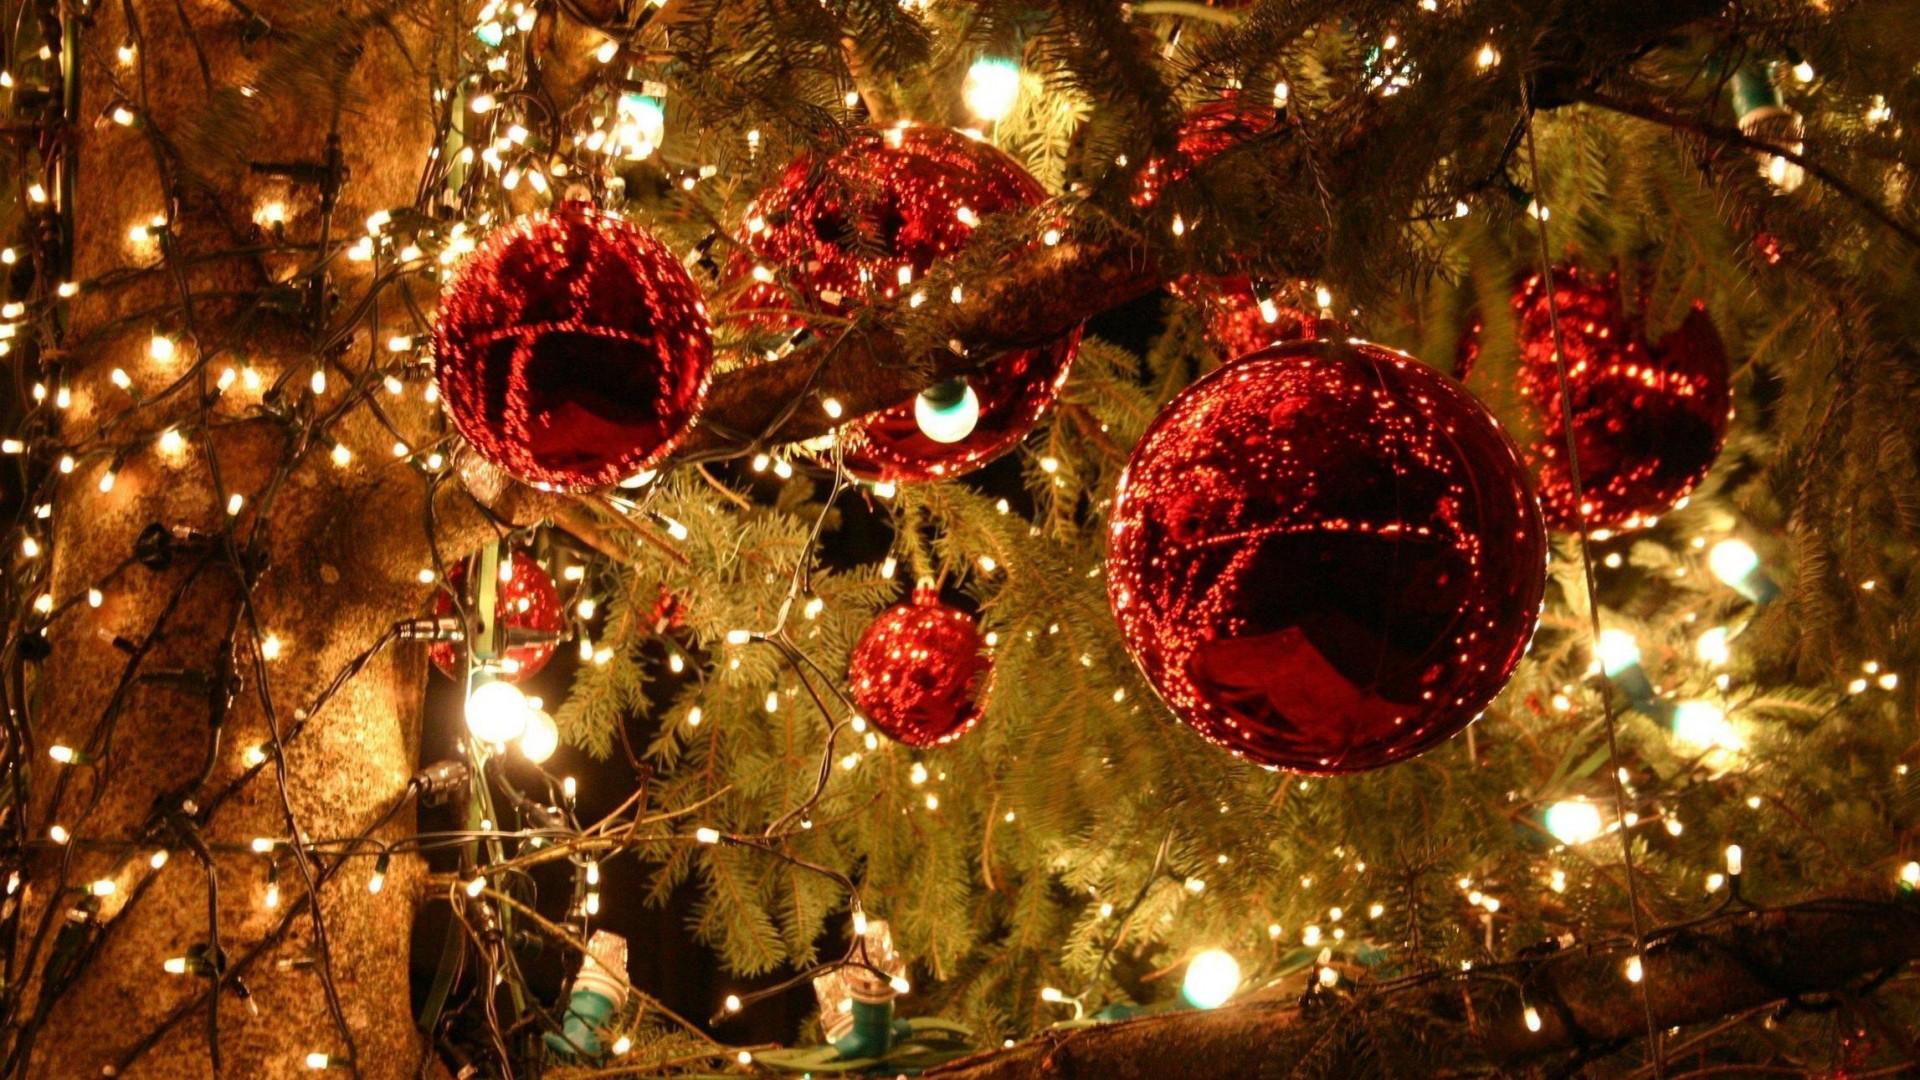 Christmas Hd Wallpaper 76 Images